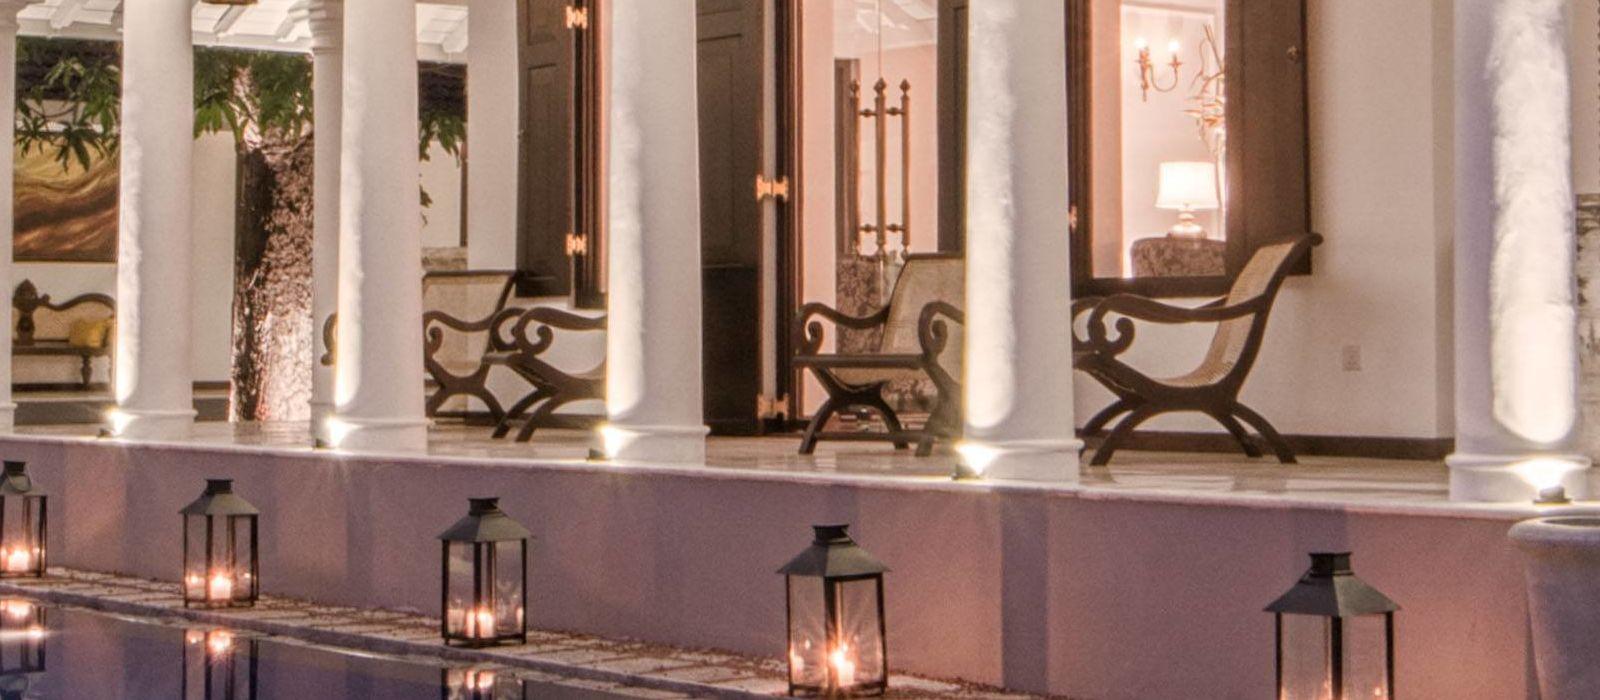 Hotel Residence By Uga Escapes Colombo Sri Lanka